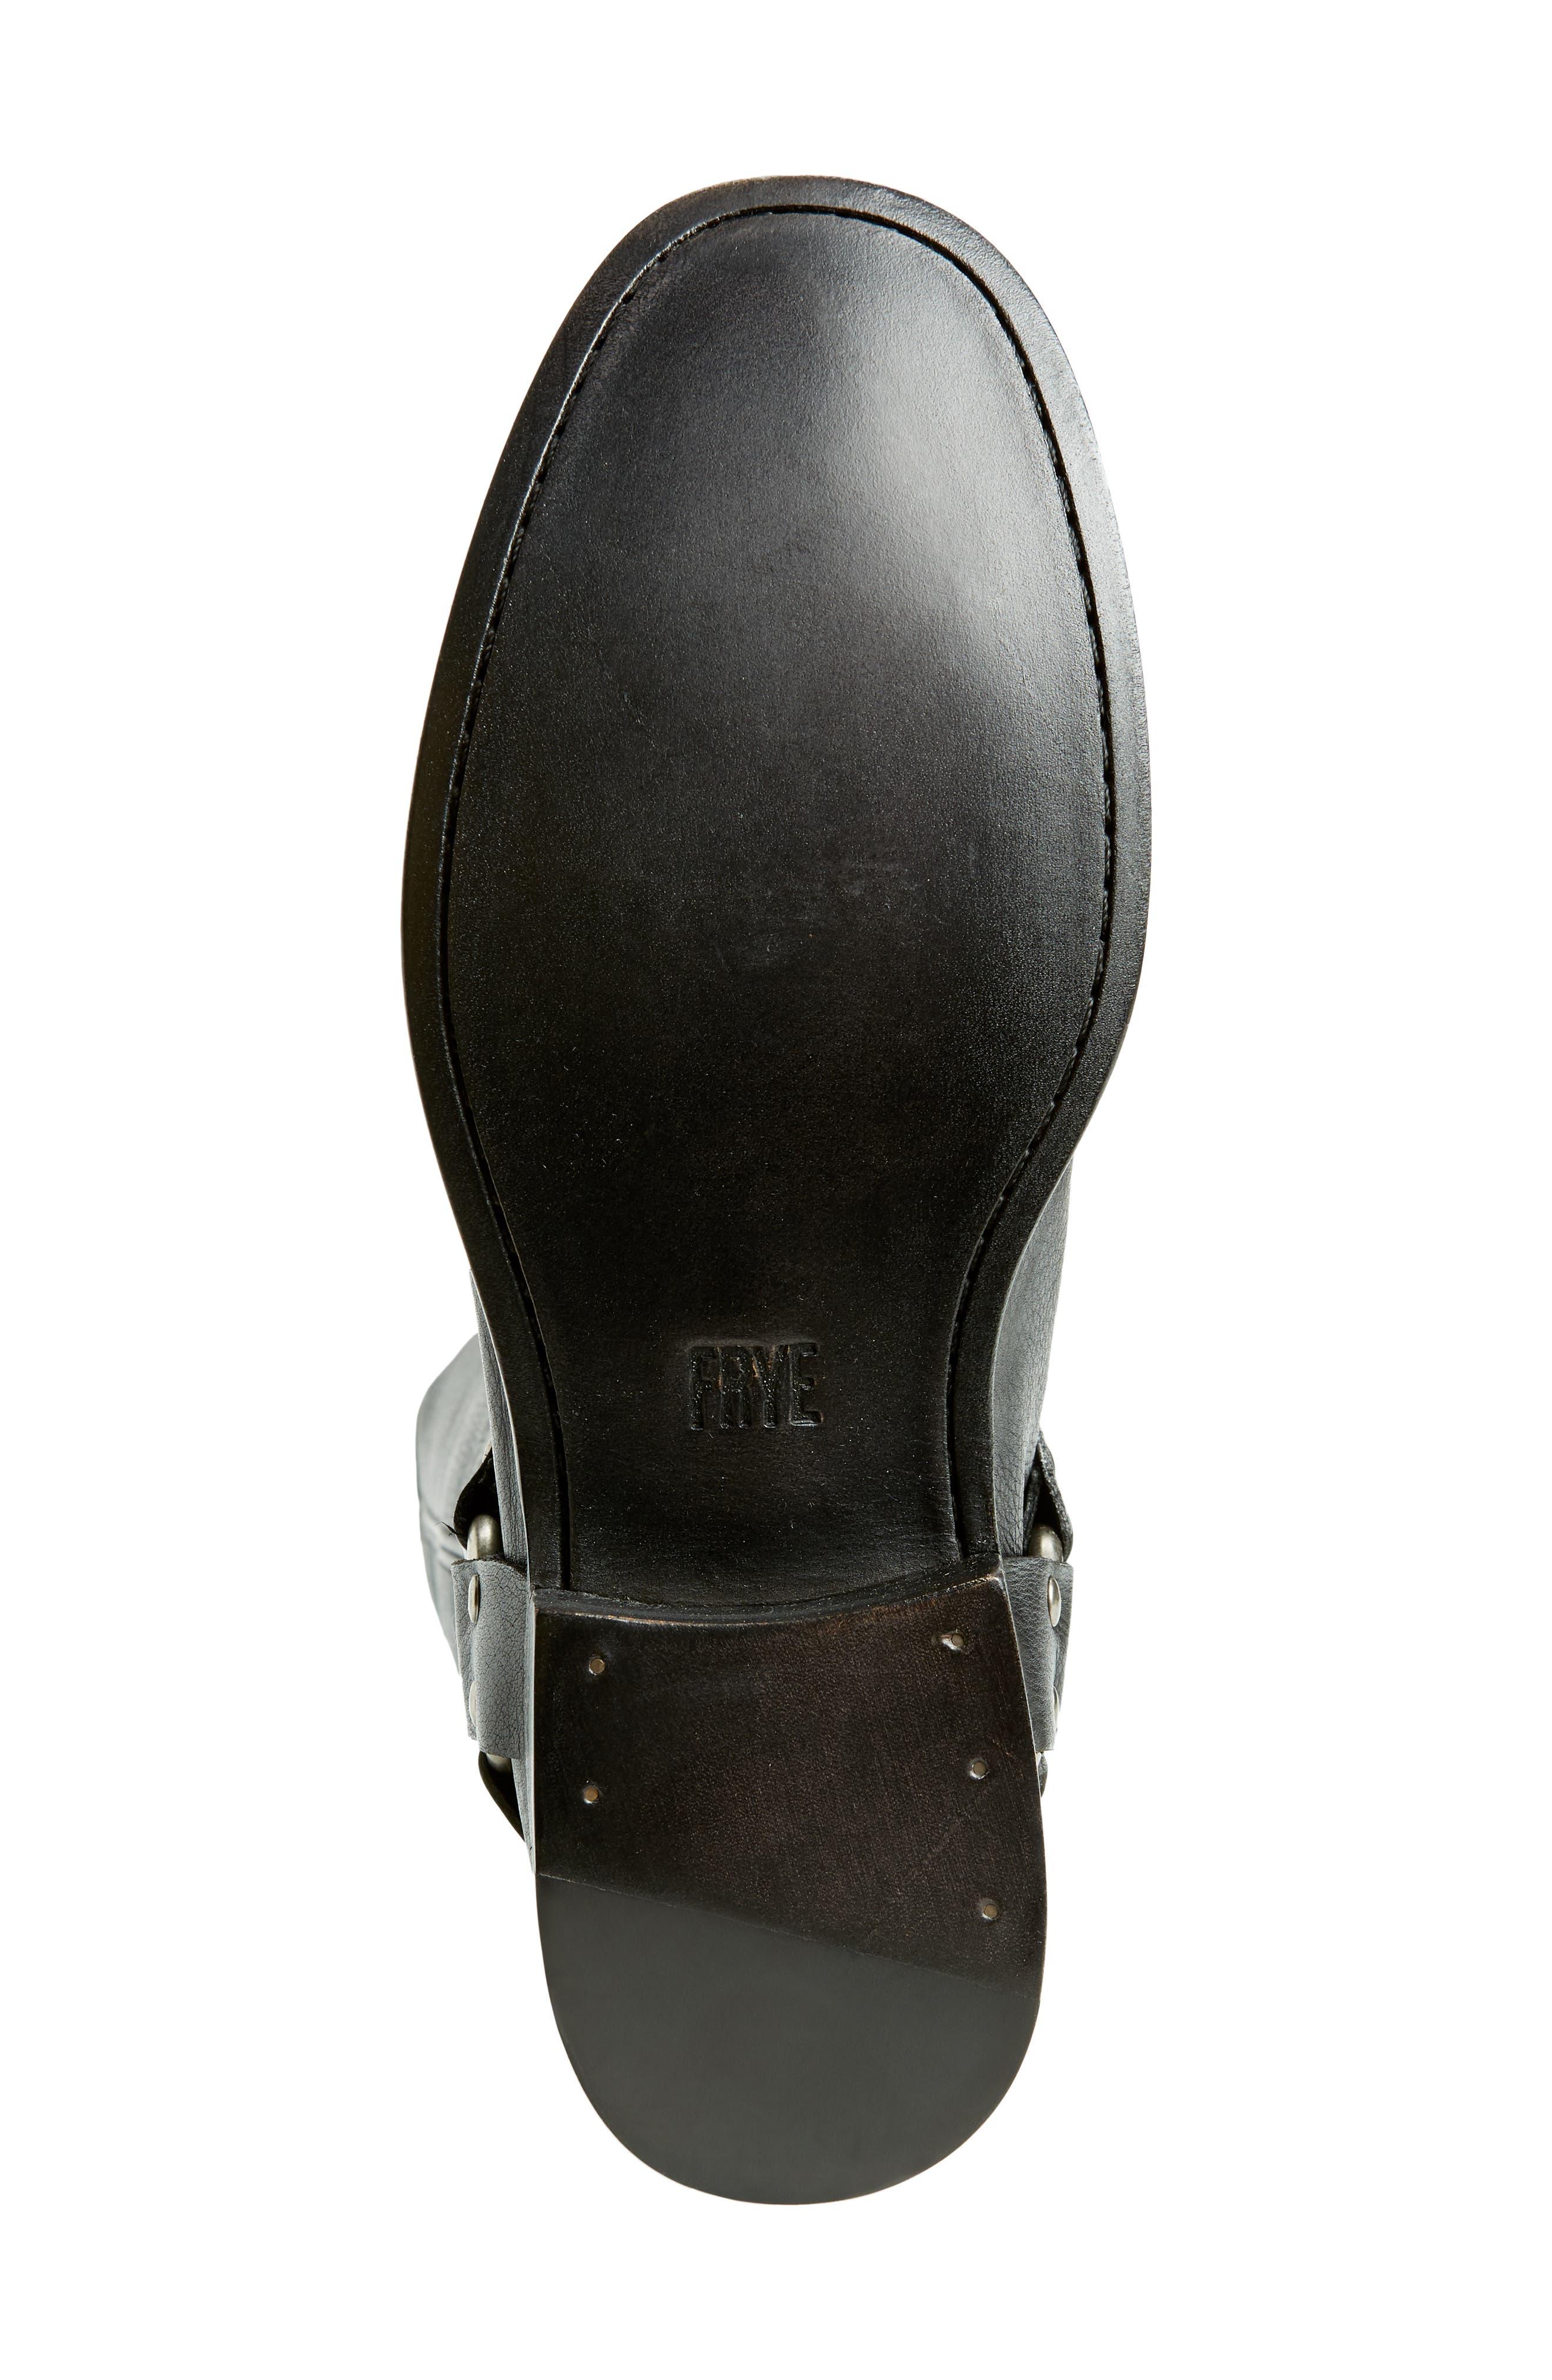 Phillip Harness Tall Boot,                             Alternate thumbnail 6, color,                             BLACK